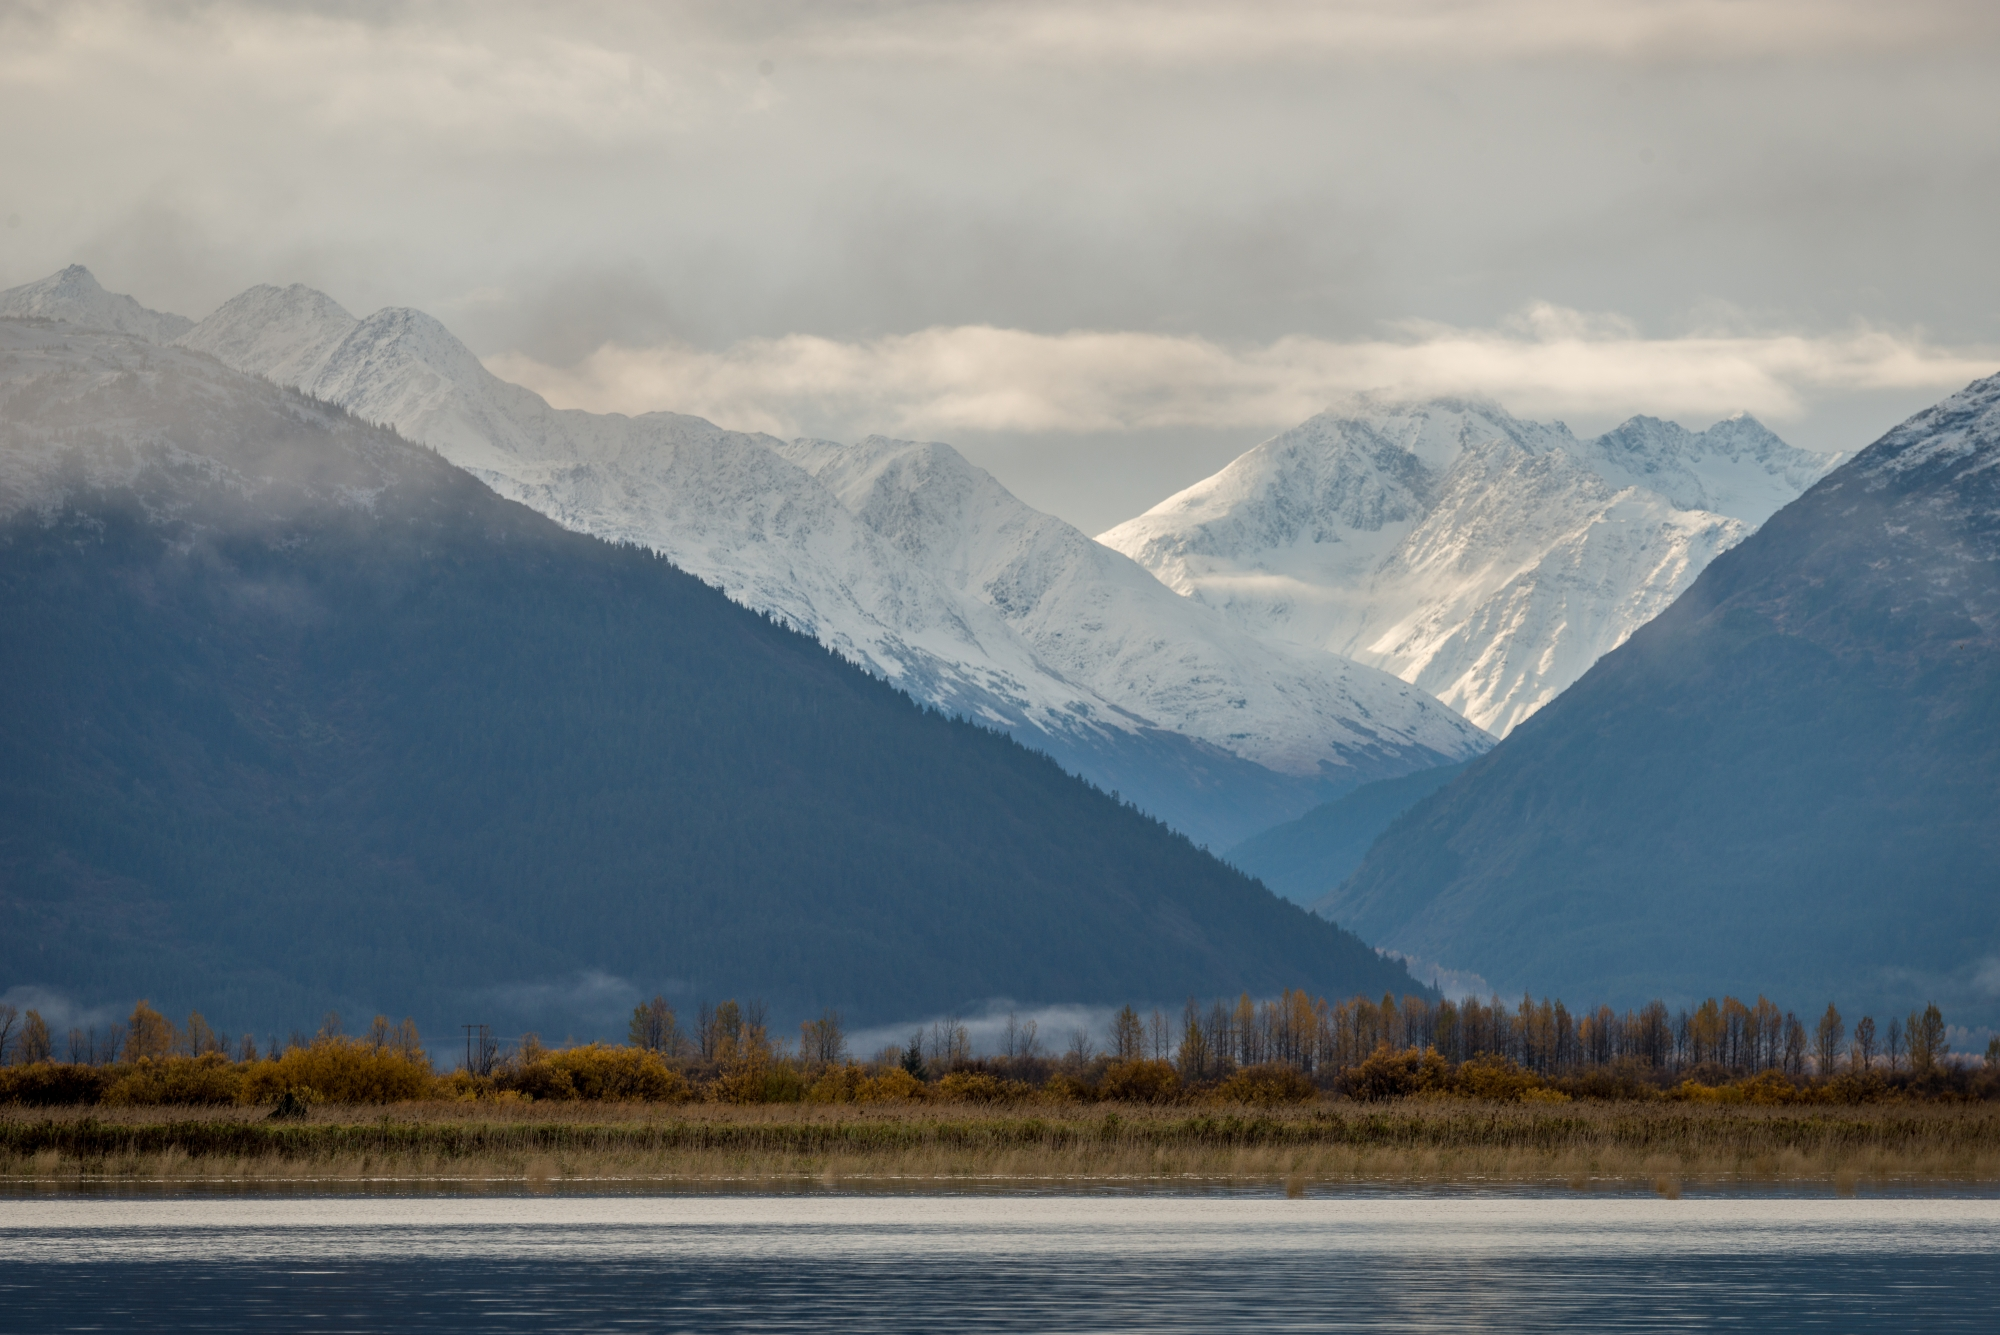 DSC9098 - Majestic mountains tower Girdwood Alaska